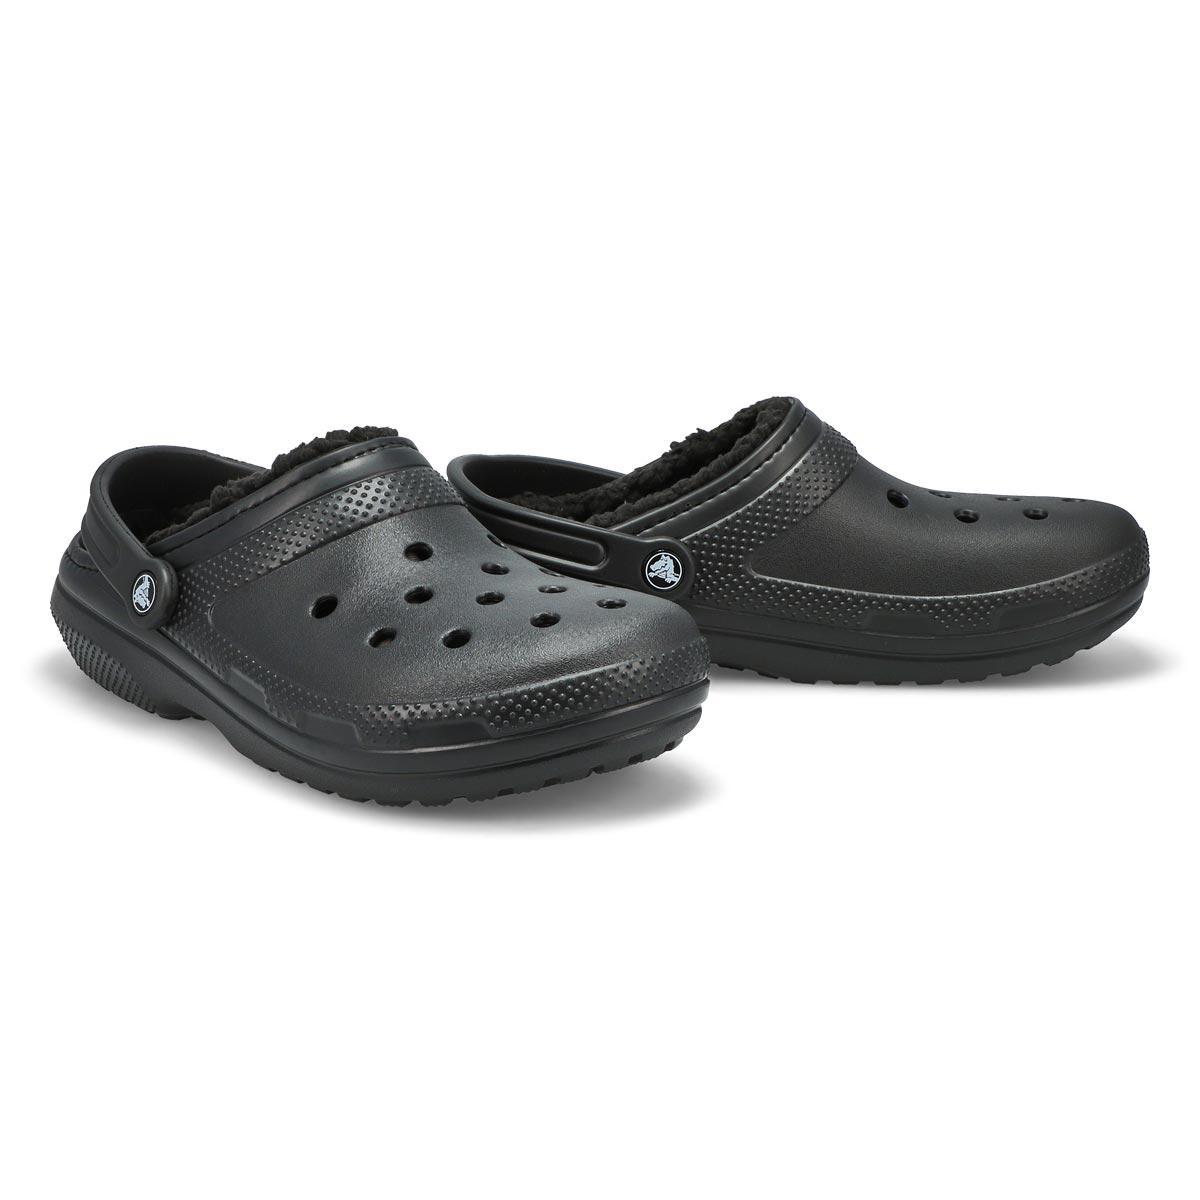 Mns Classic Lined black comfort clog